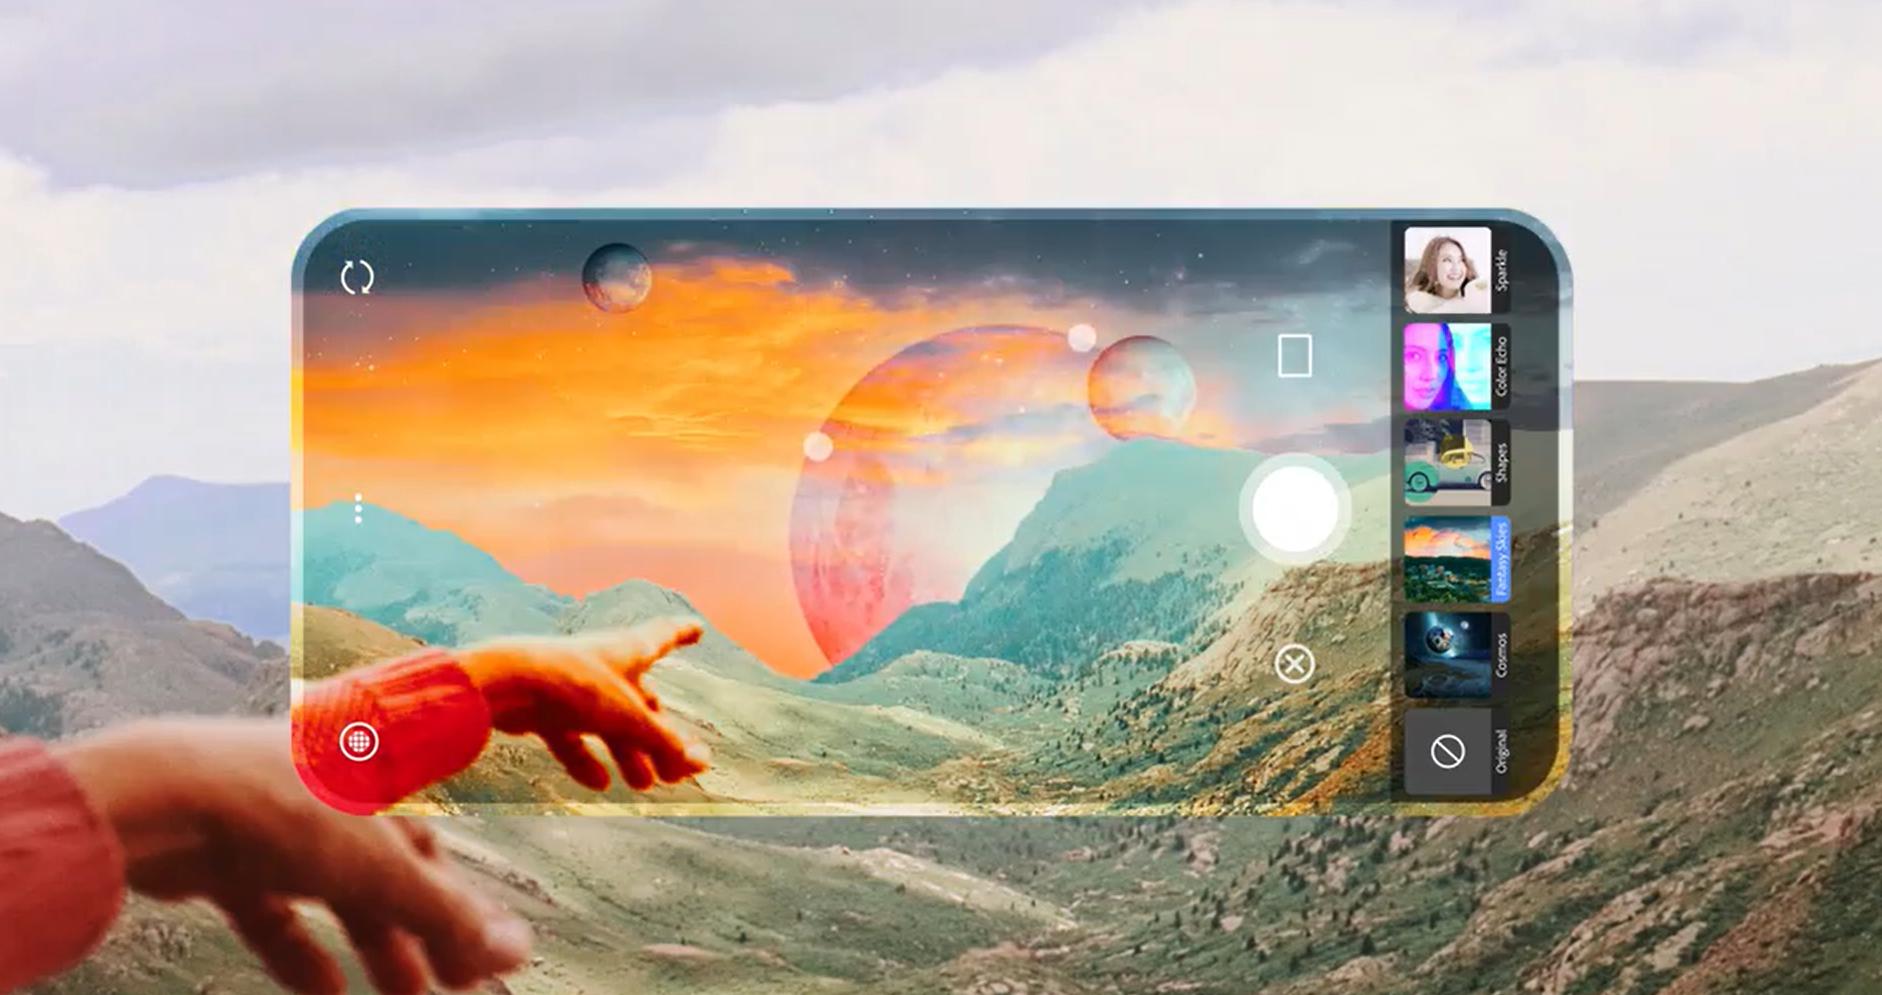 Adobe slipper Photoshop Camera til iOS og Android